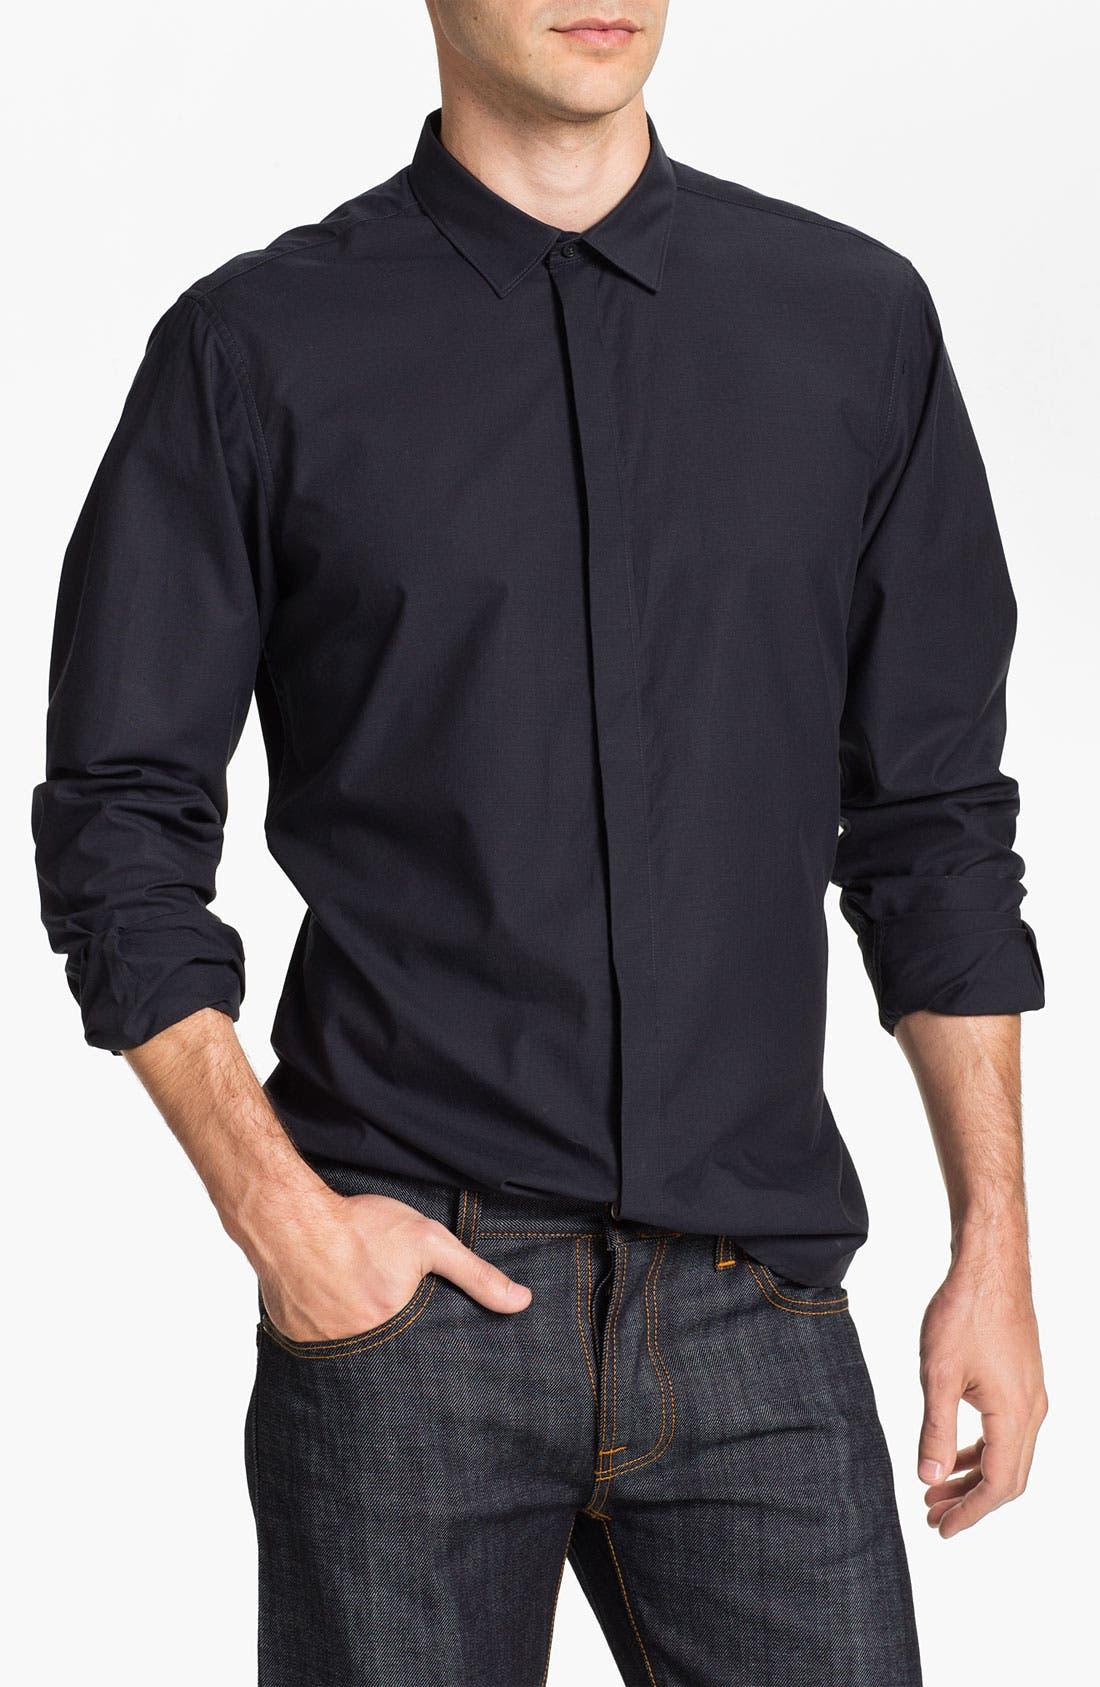 Alternate Image 1 Selected - Ben Sherman Solid Woven Shirt